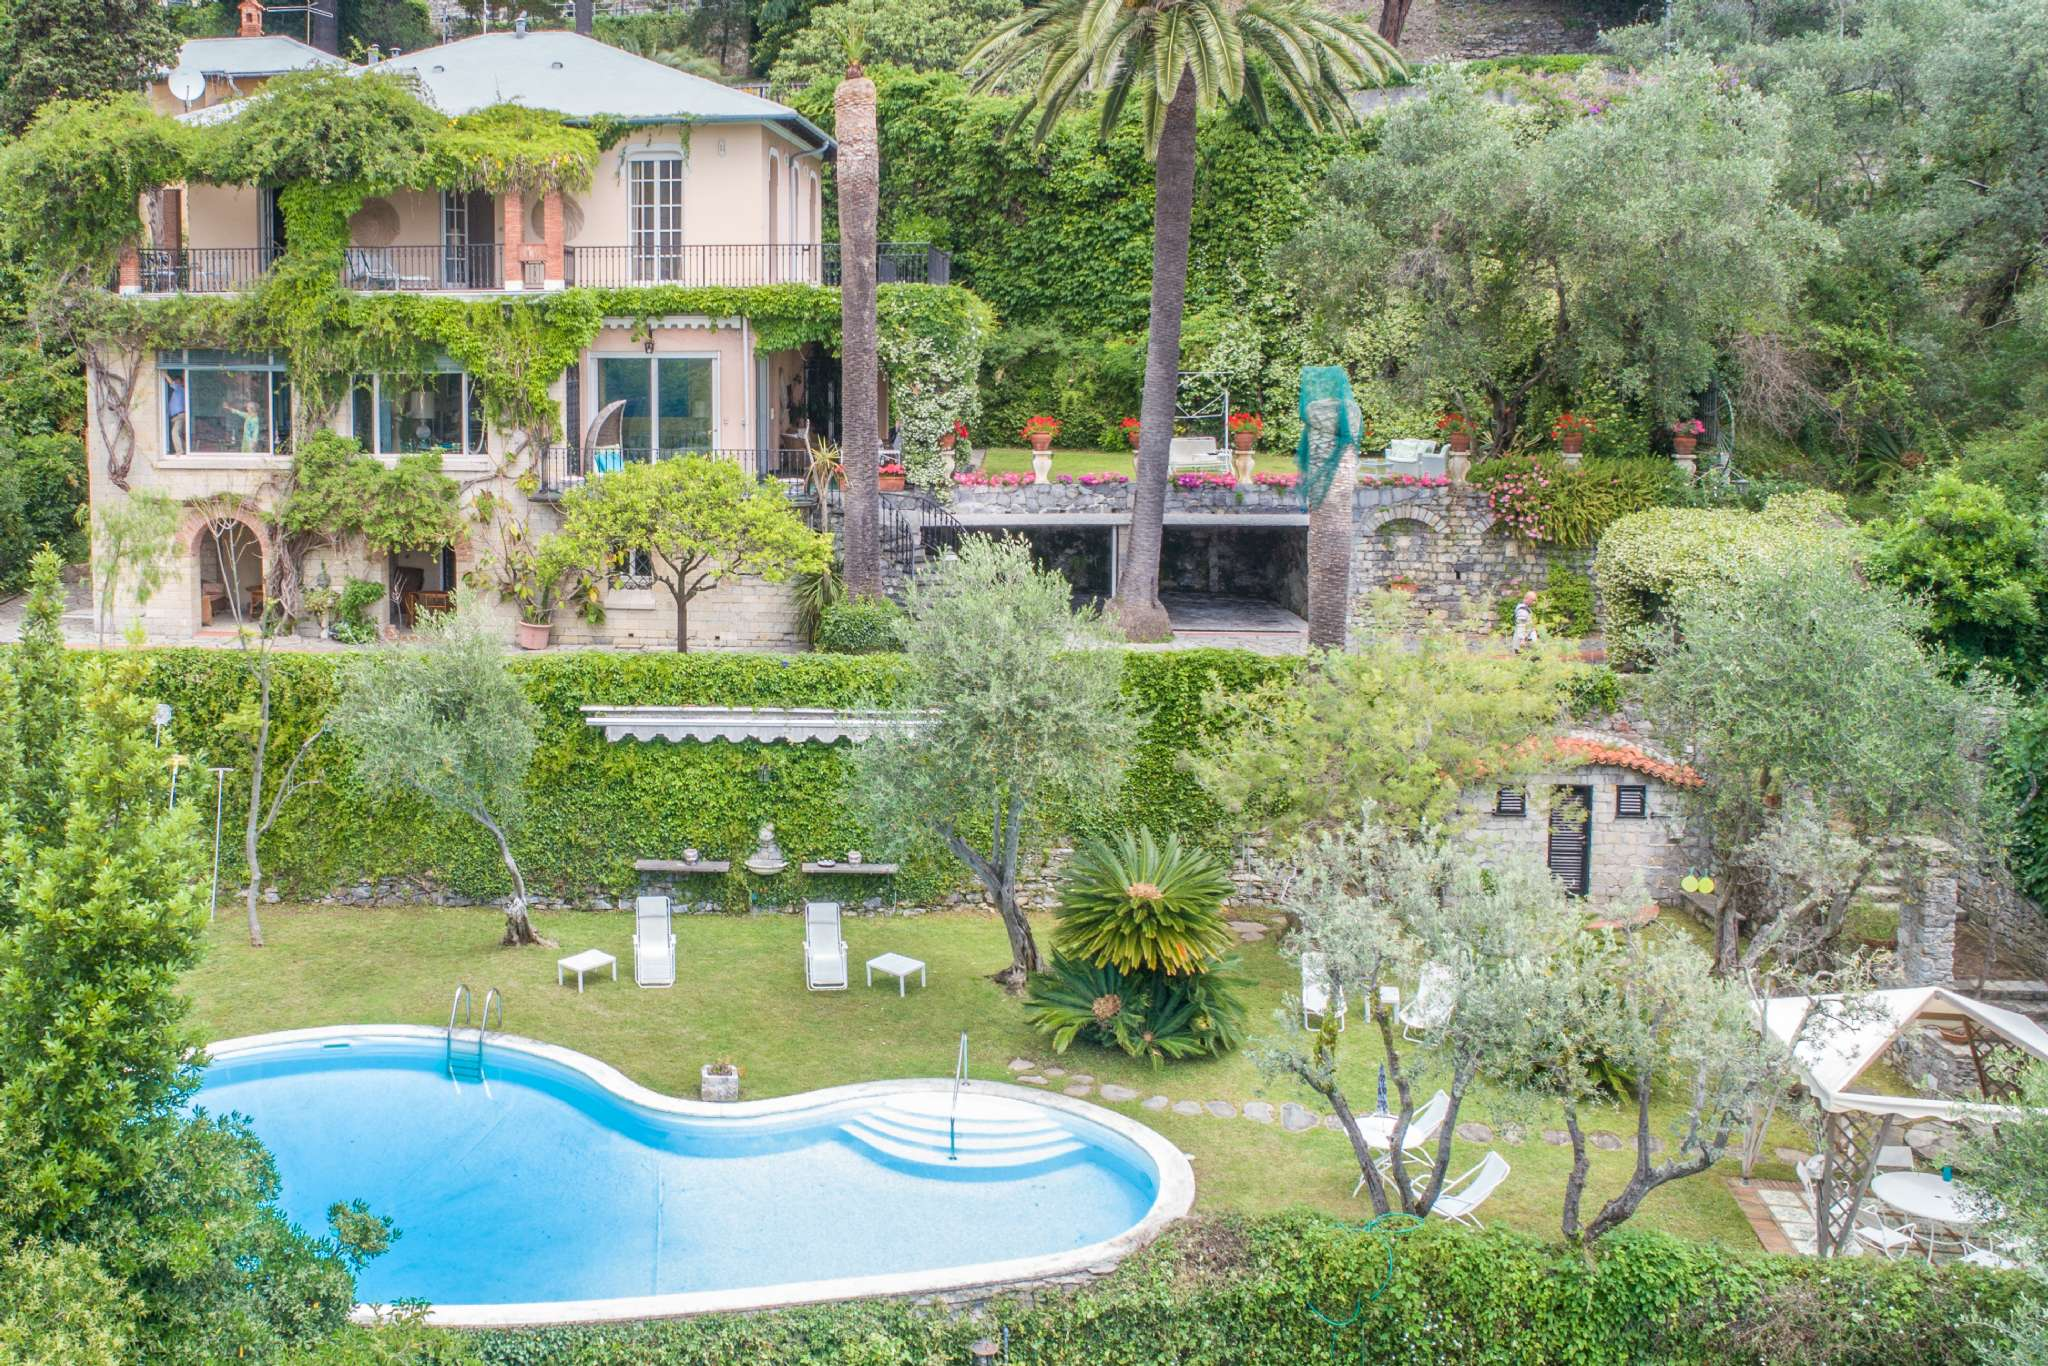 Villa in Vendita a Santa Margherita Ligure: 0 locali, 530 mq - Foto 2